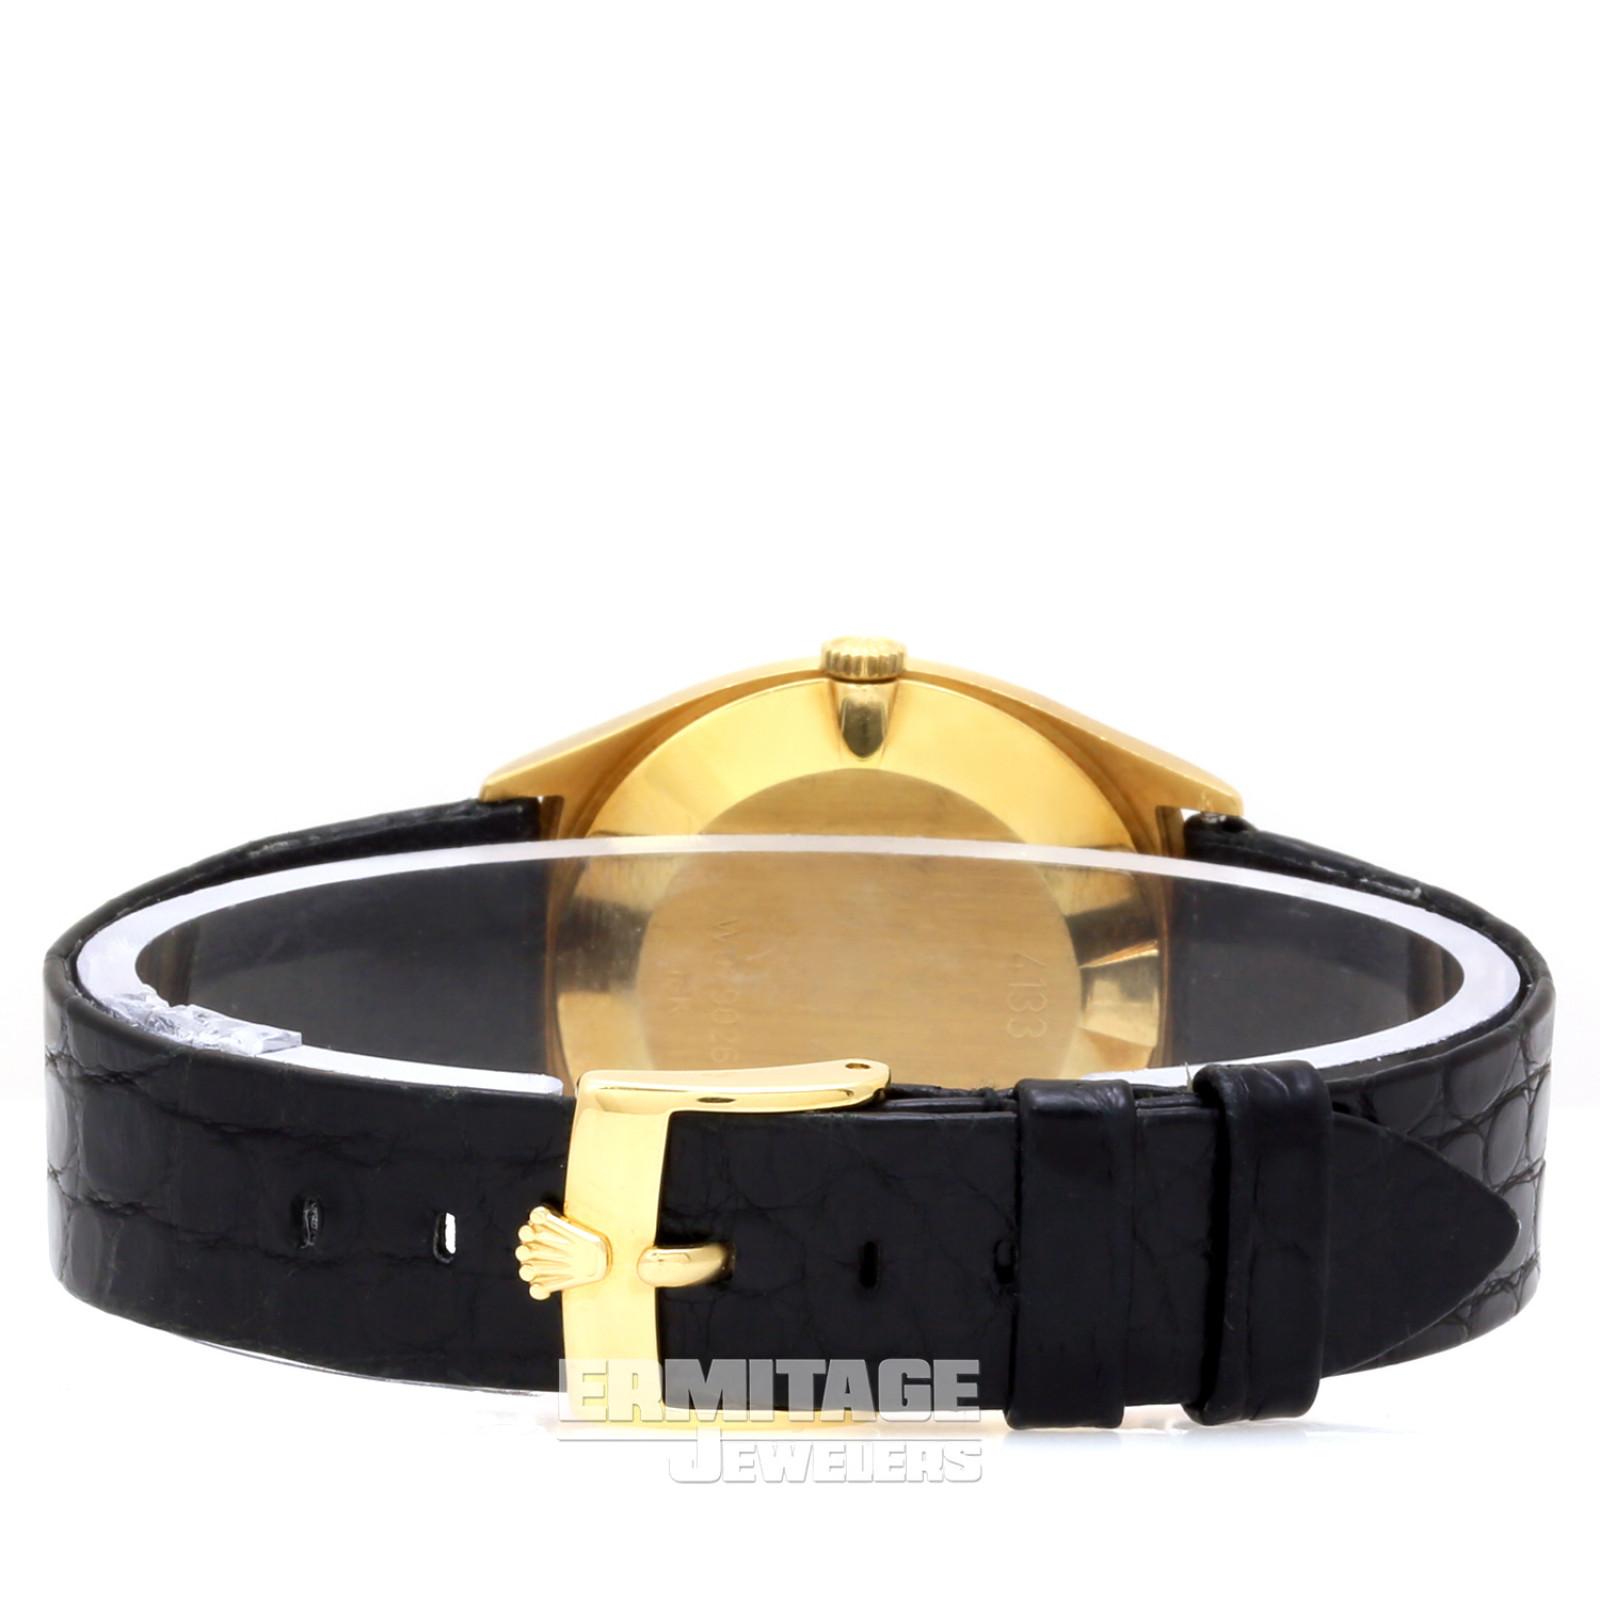 Gold on Strap Rolex Cellini 4133 31 mm